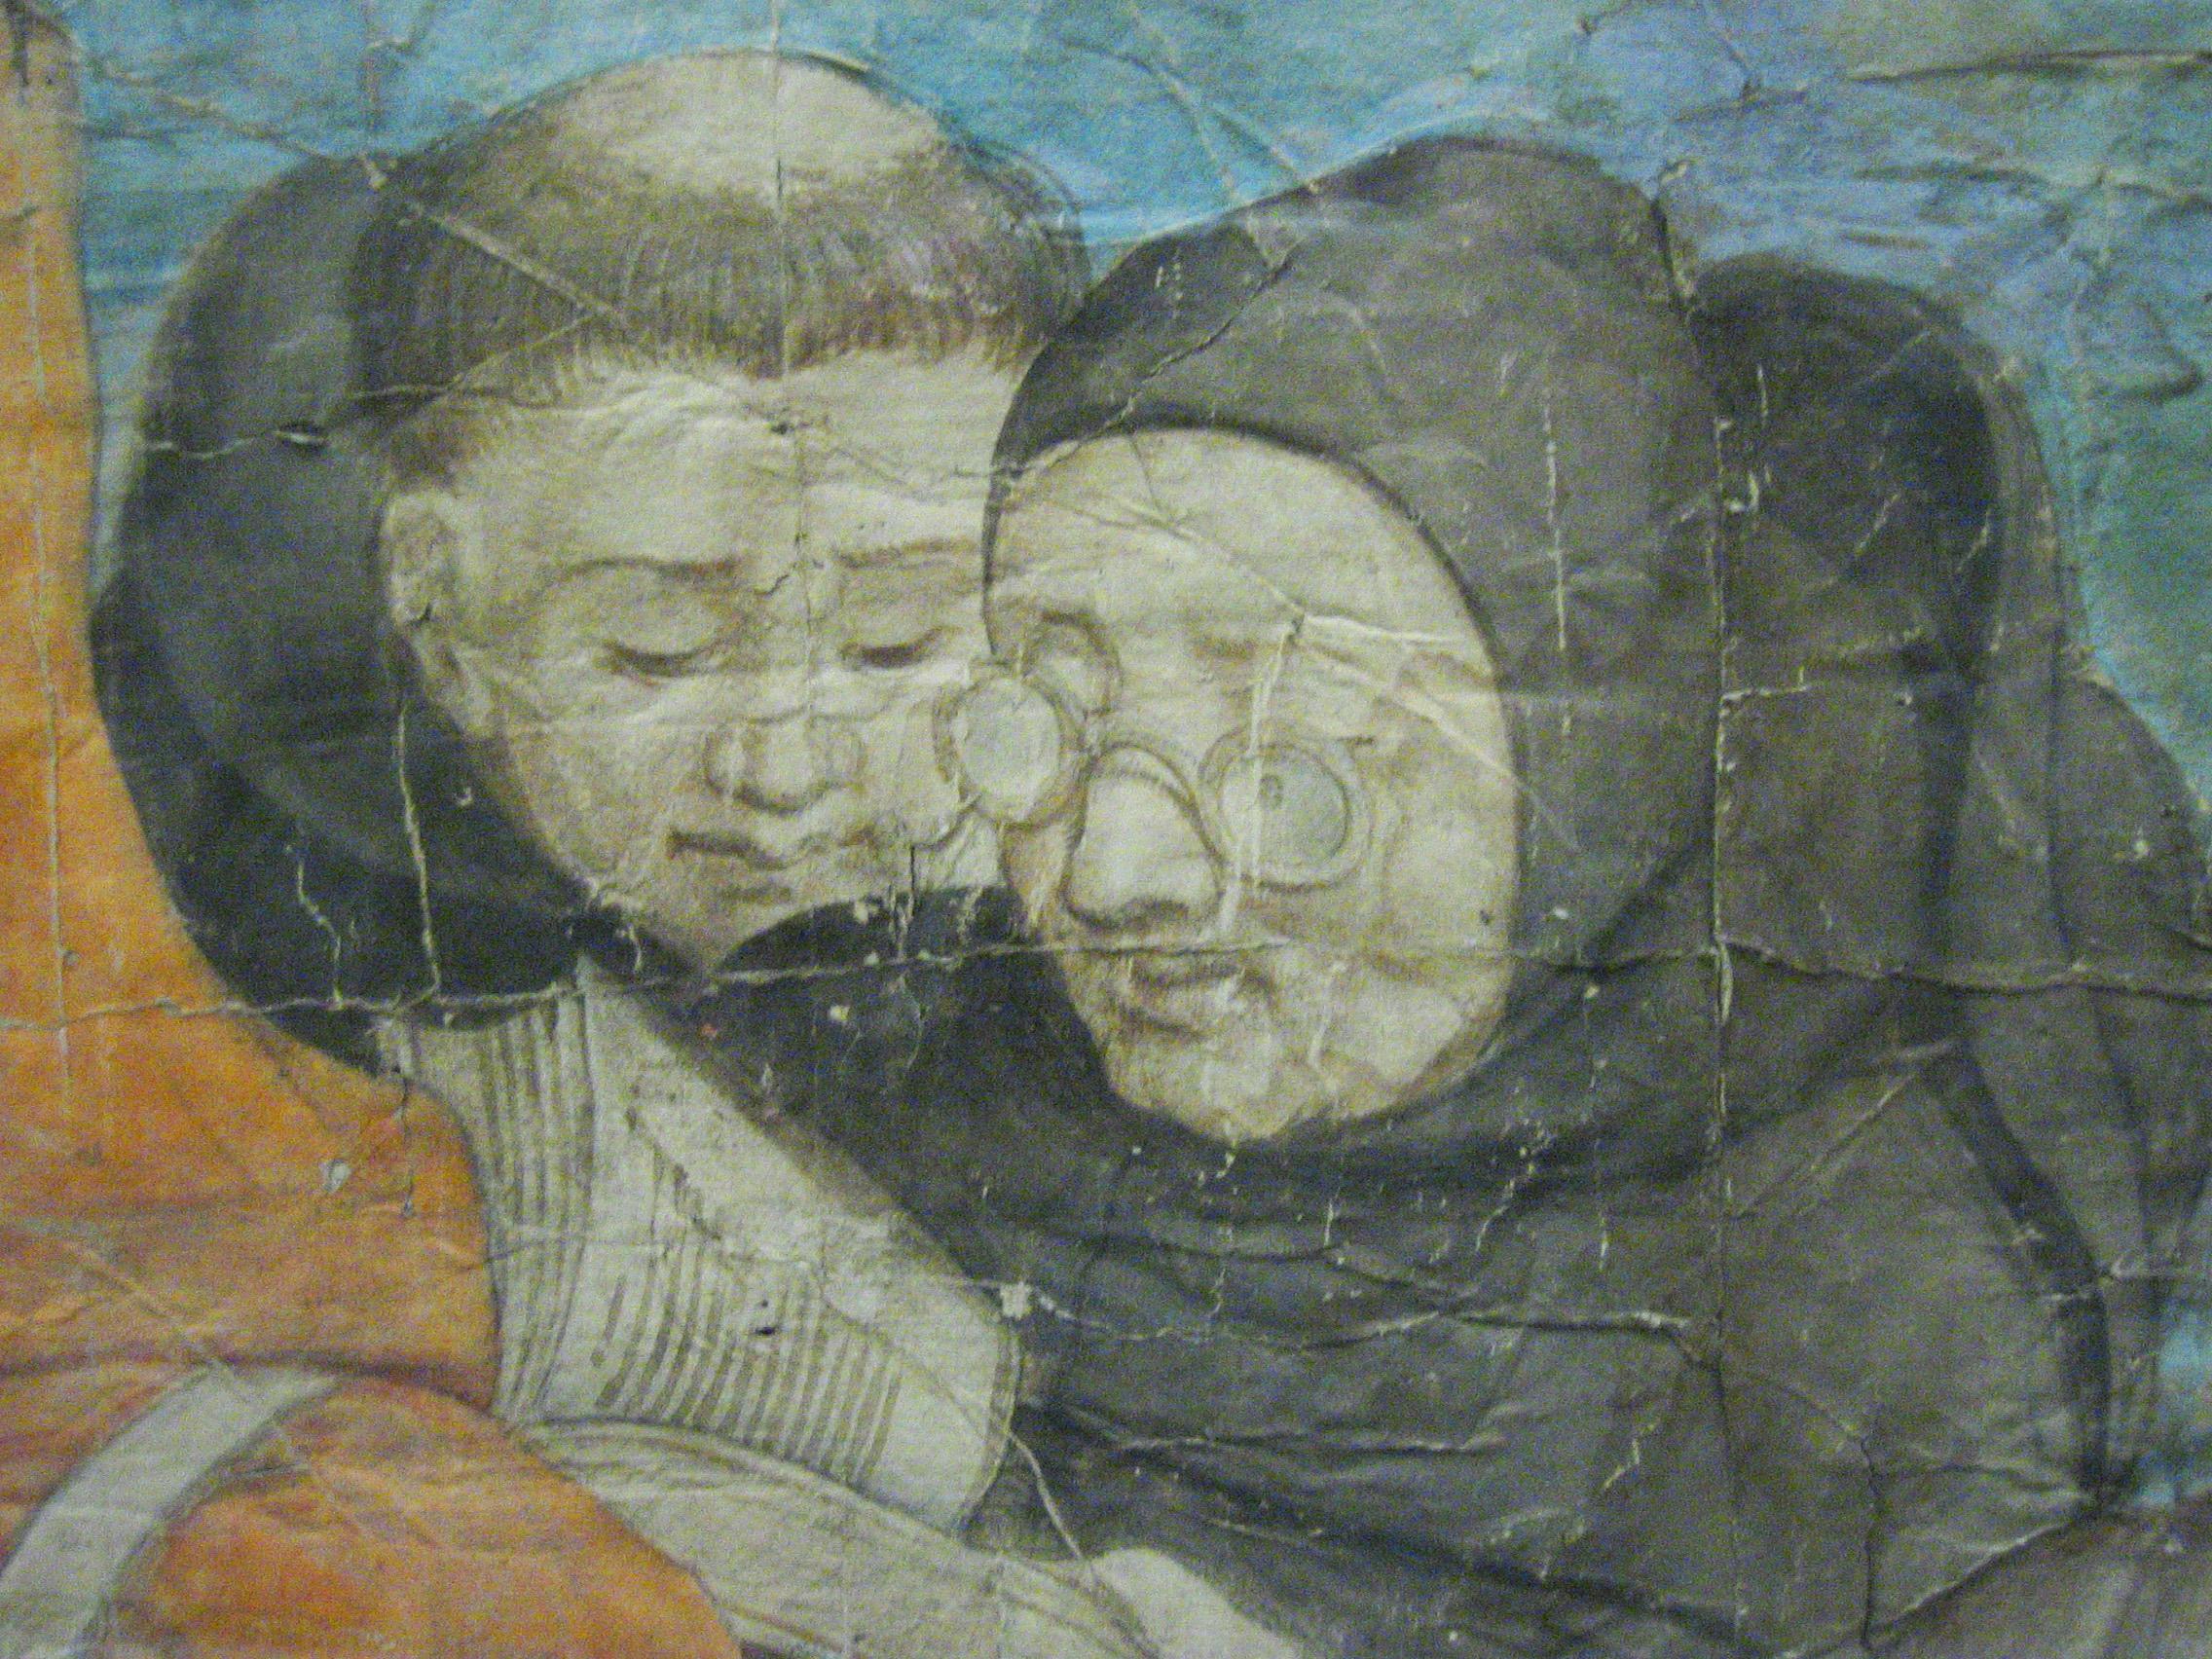 Jan Vermeyen - Landung bei Tunis